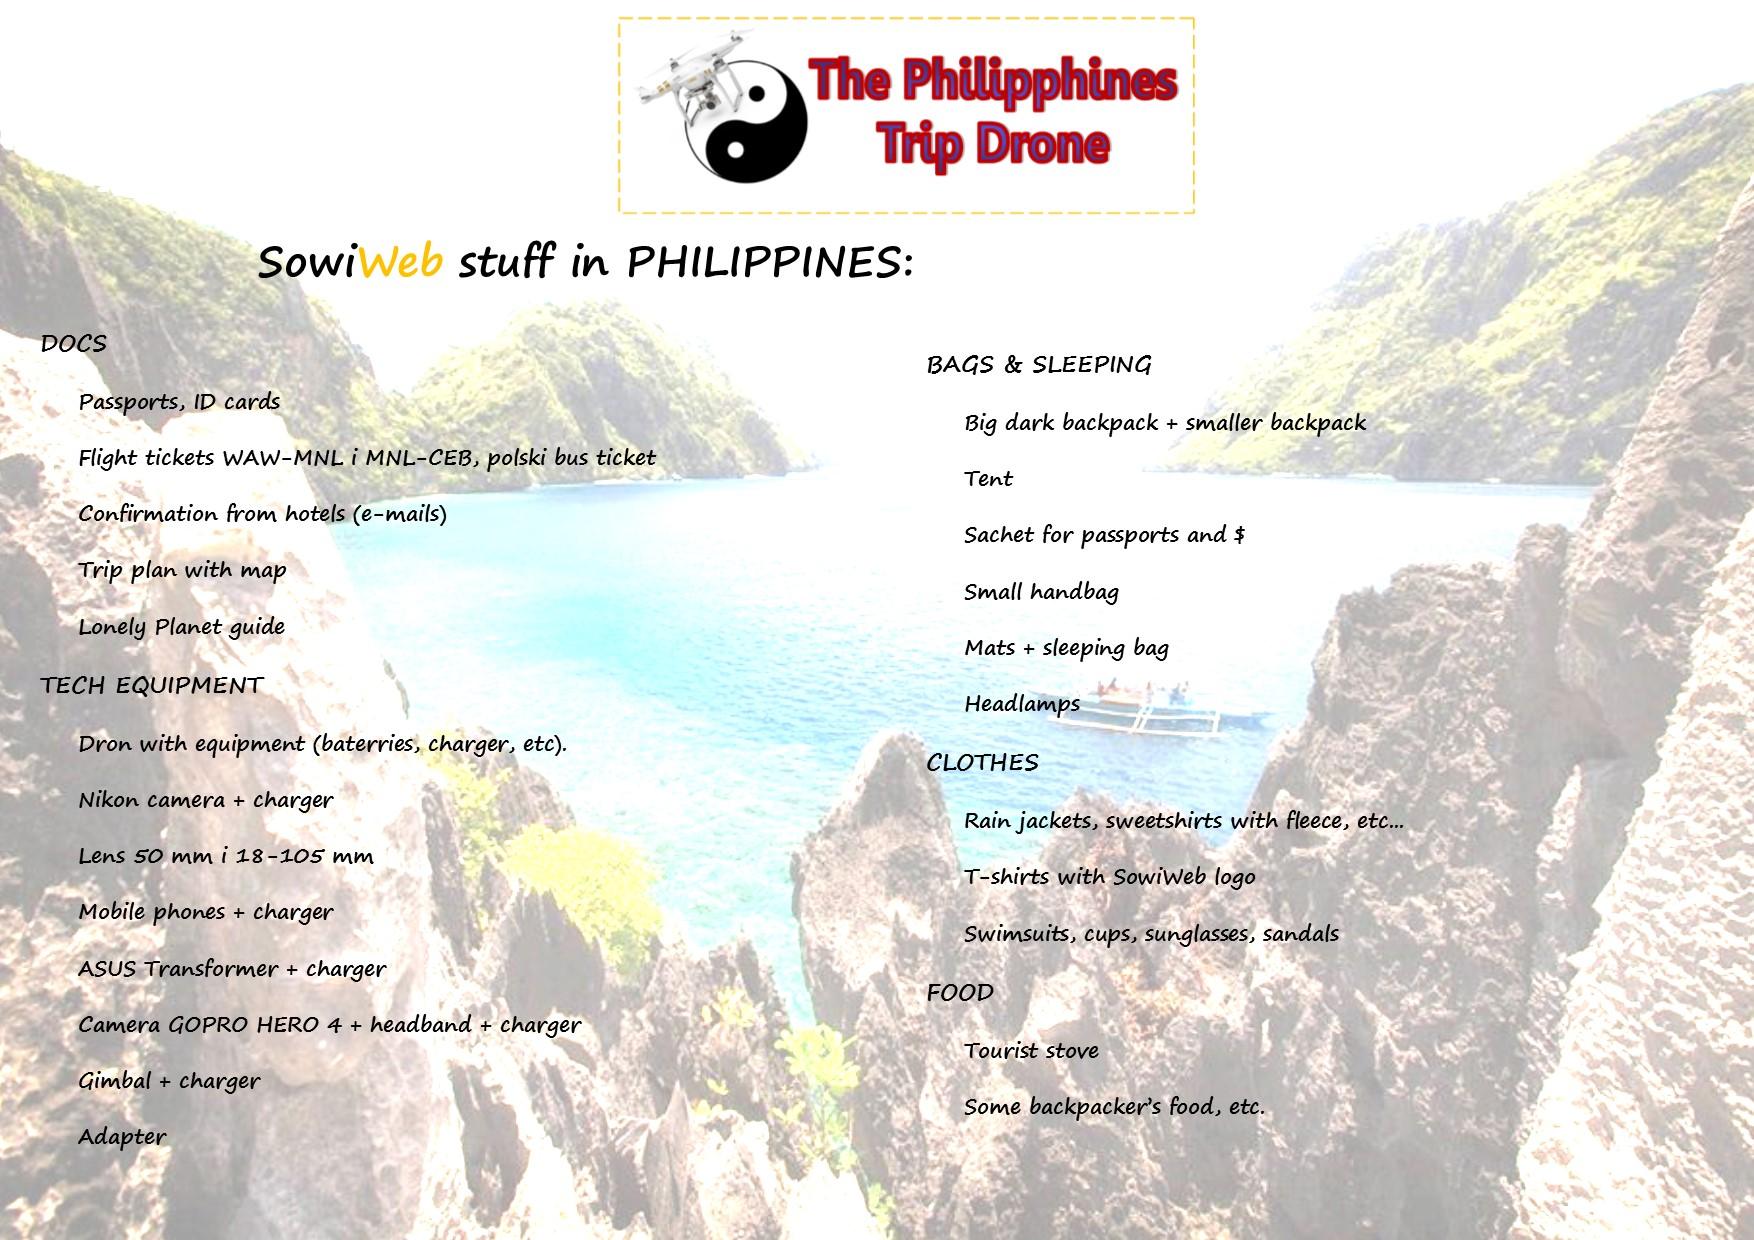 Filmowanie dronem na Filipinach